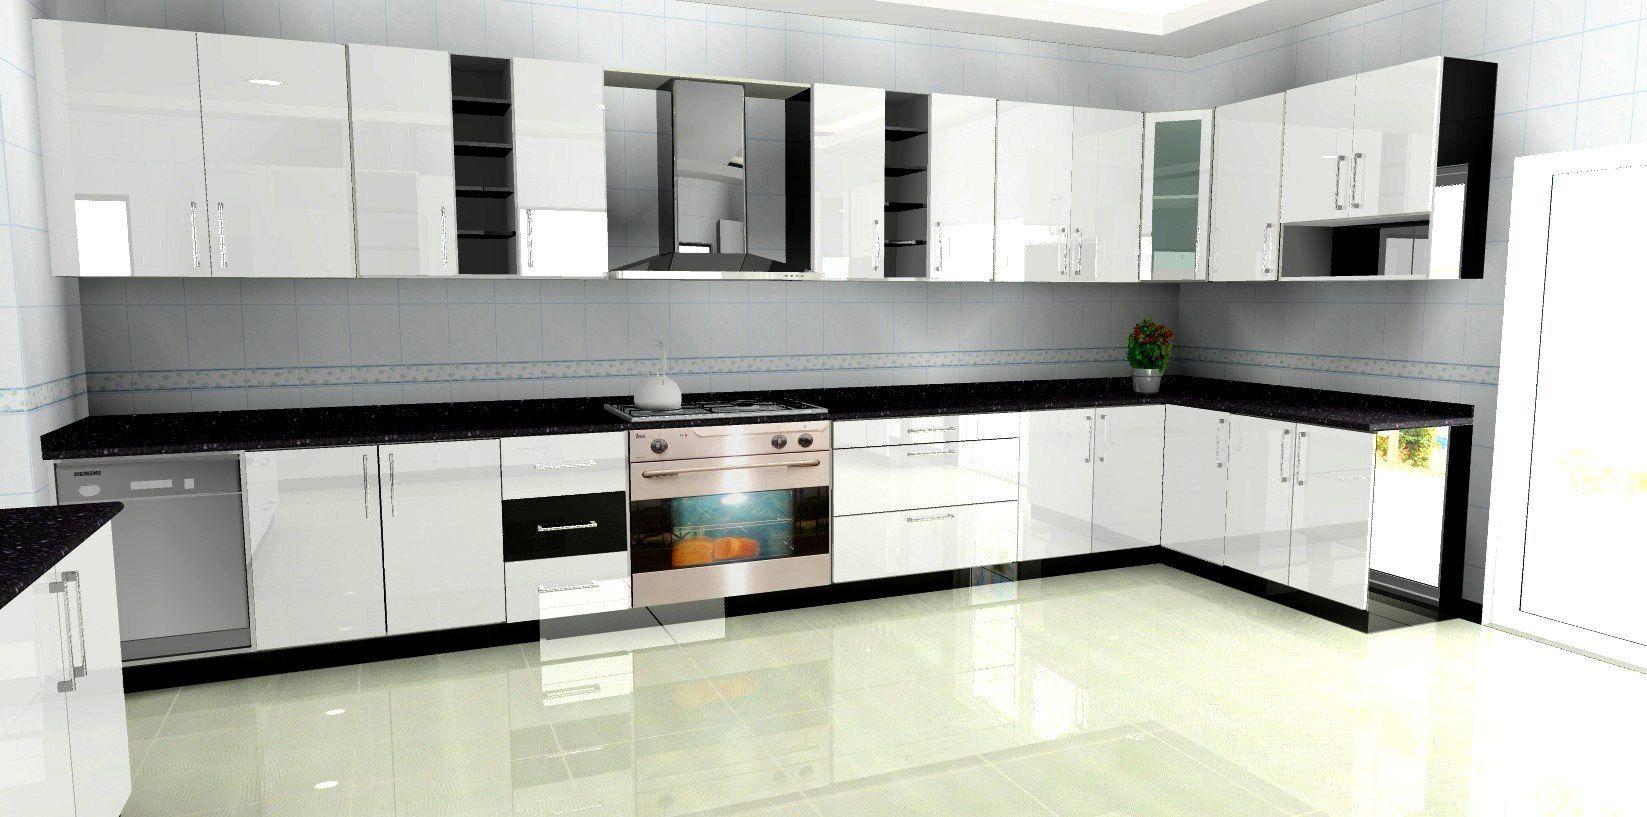 Cool Kitchen Cabinets Aluminium Aluminum Kitchen Cabinets Aluminium Kitchen Kitchen Cabinets